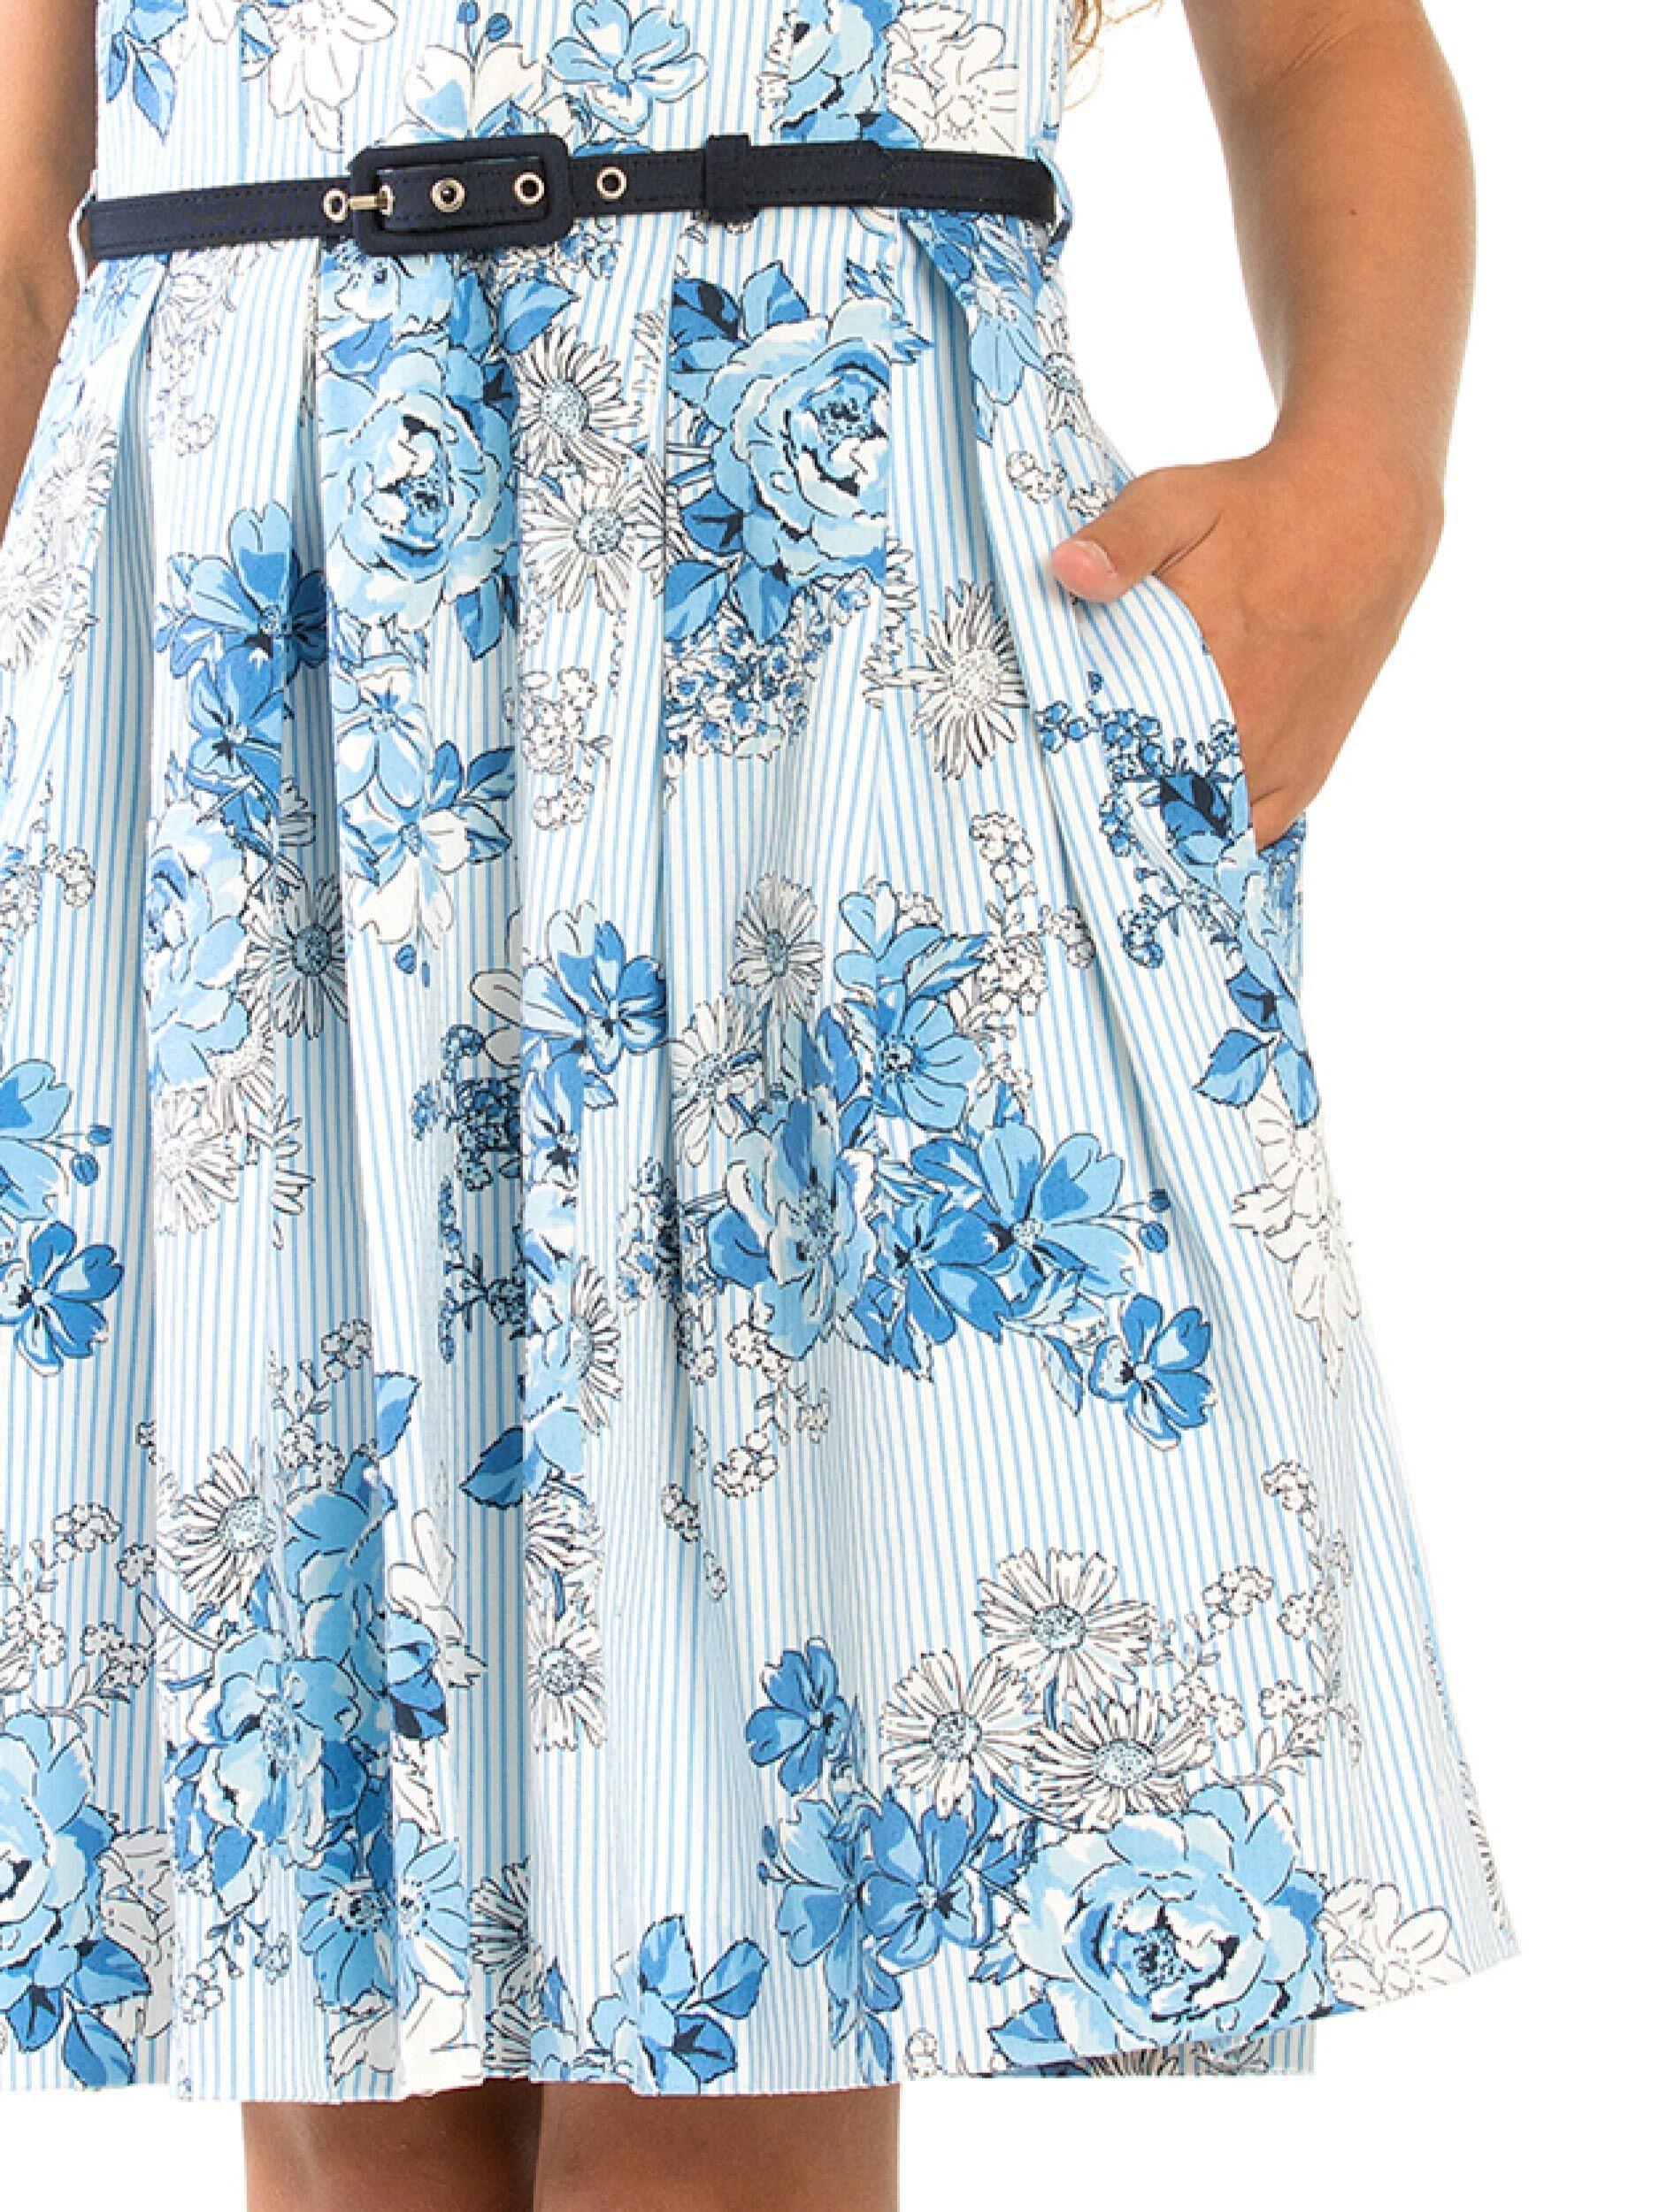 8-14 Girls Floral Dobby Prom Dress